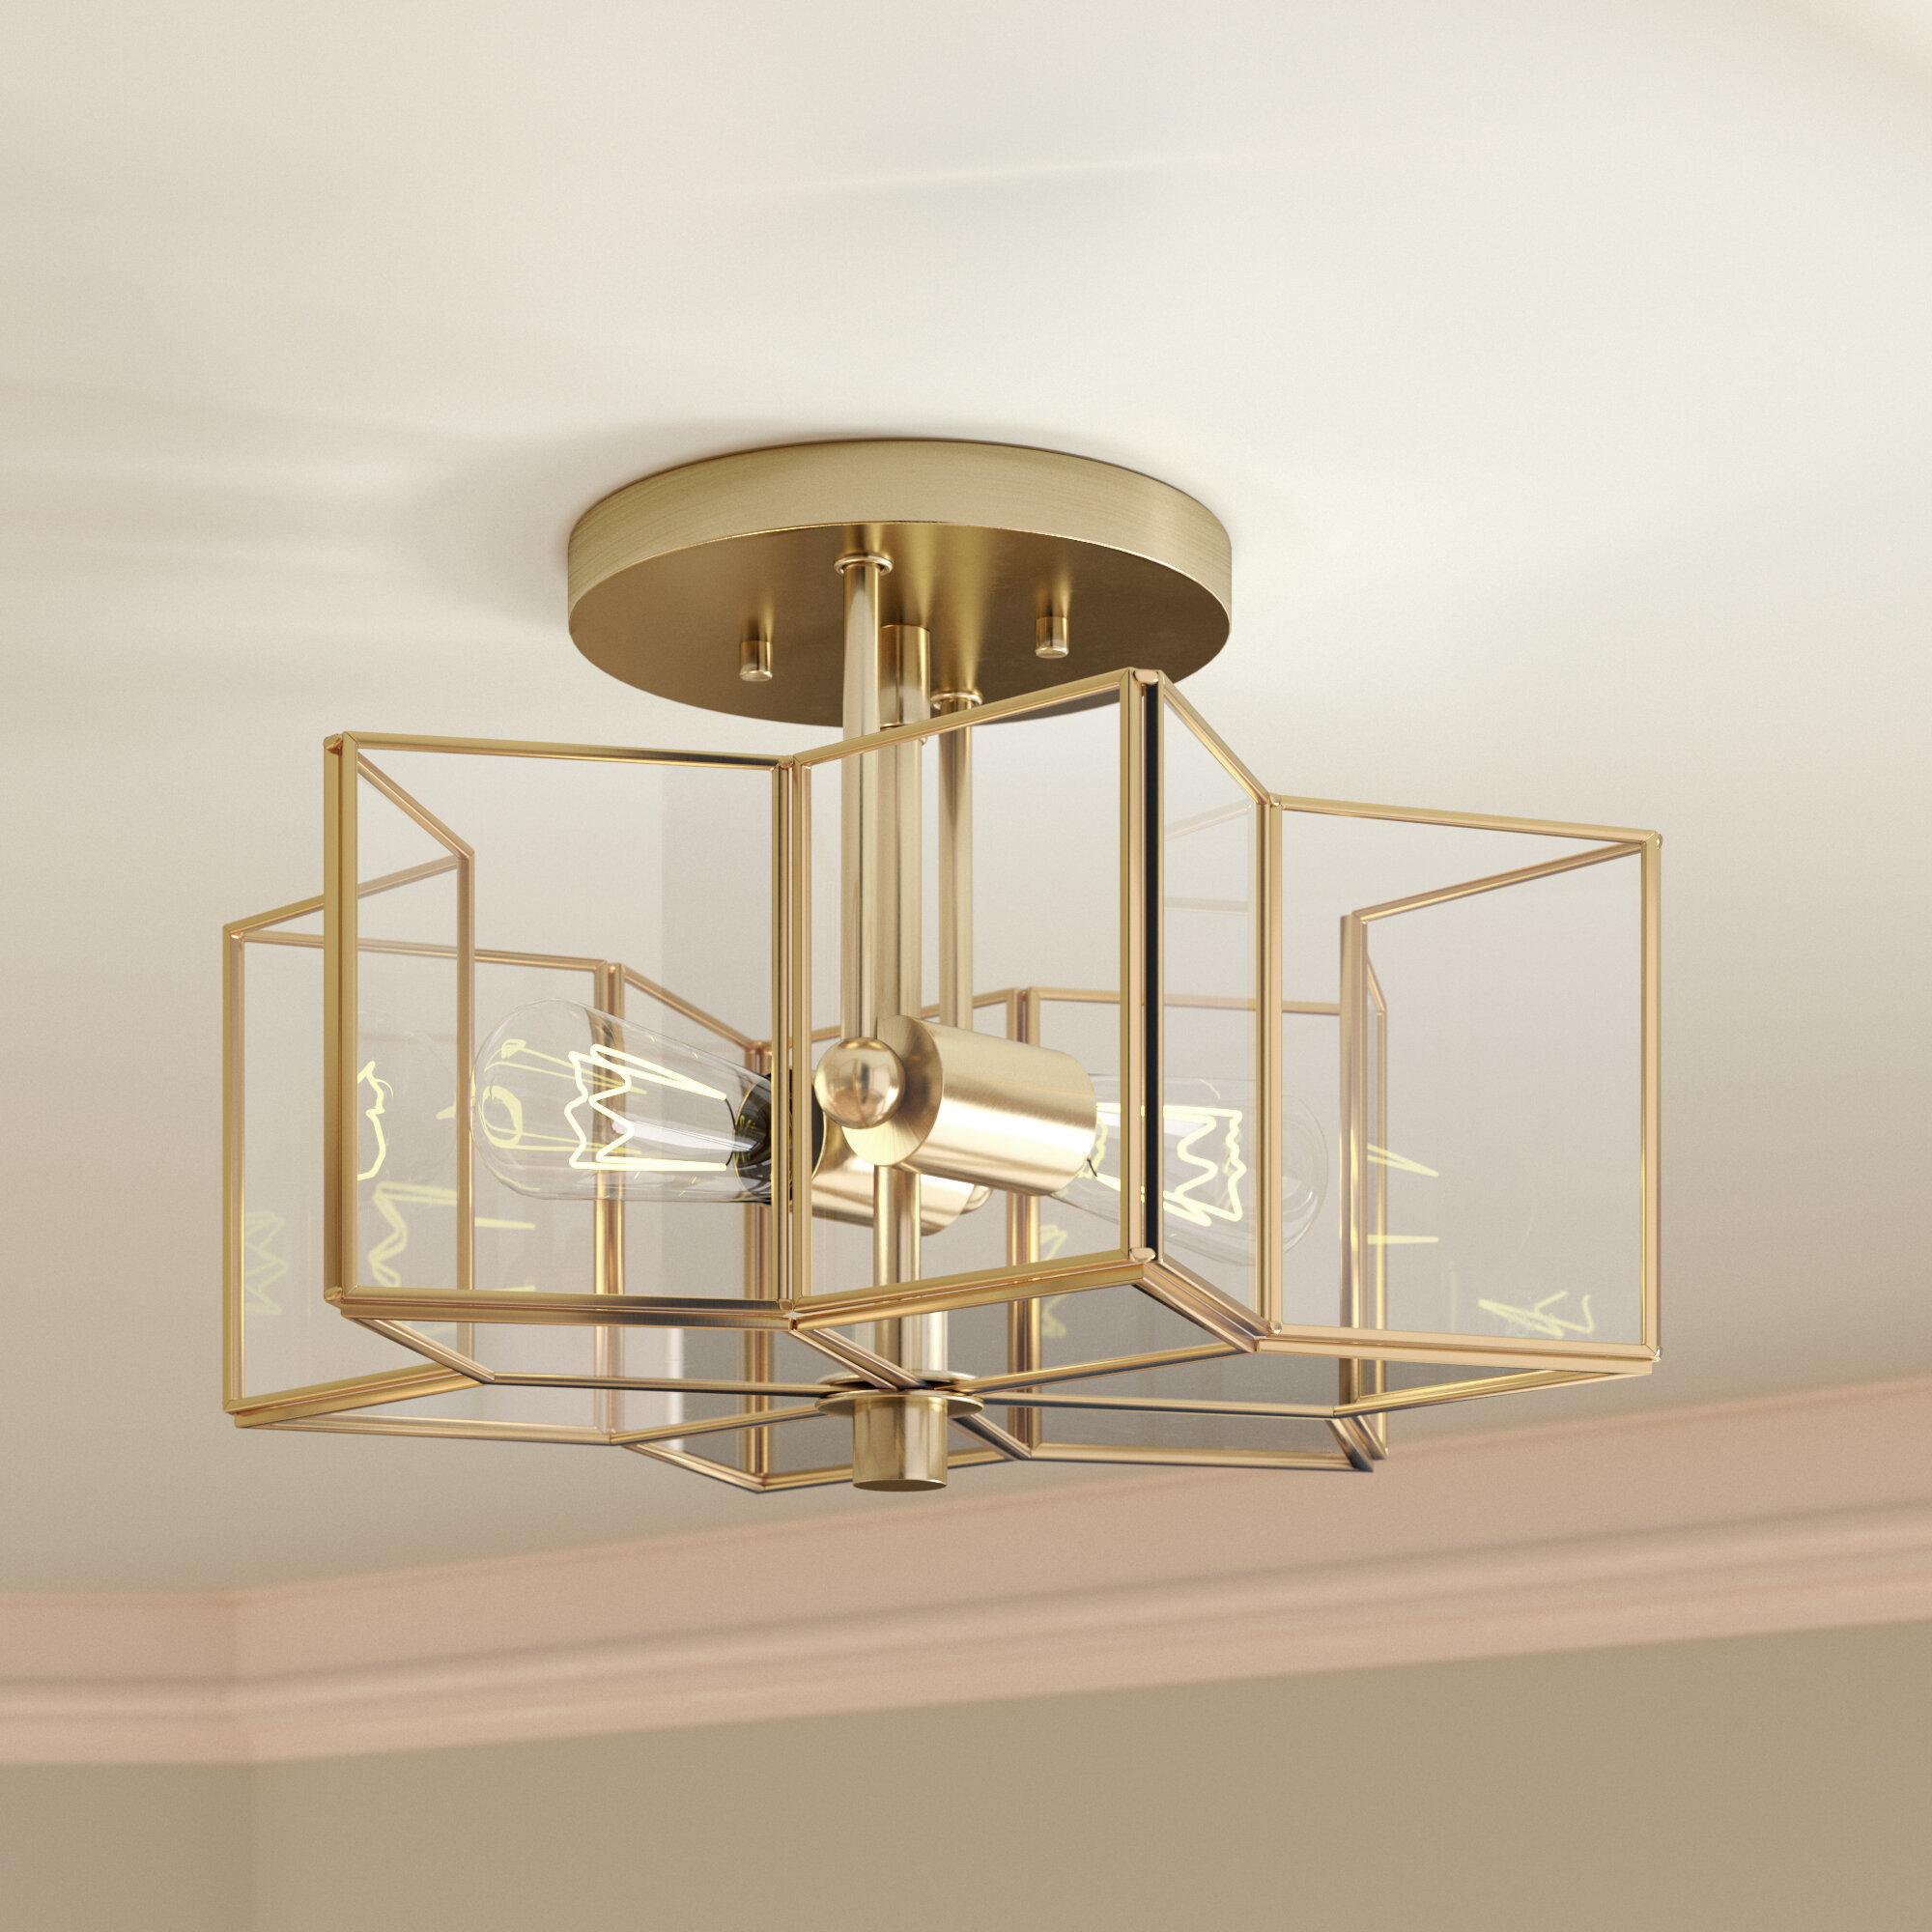 Flush Mount Dining Room Light | Willa Arlo Interiors Boswell 2 Light Flush Mount Reviews Wayfair